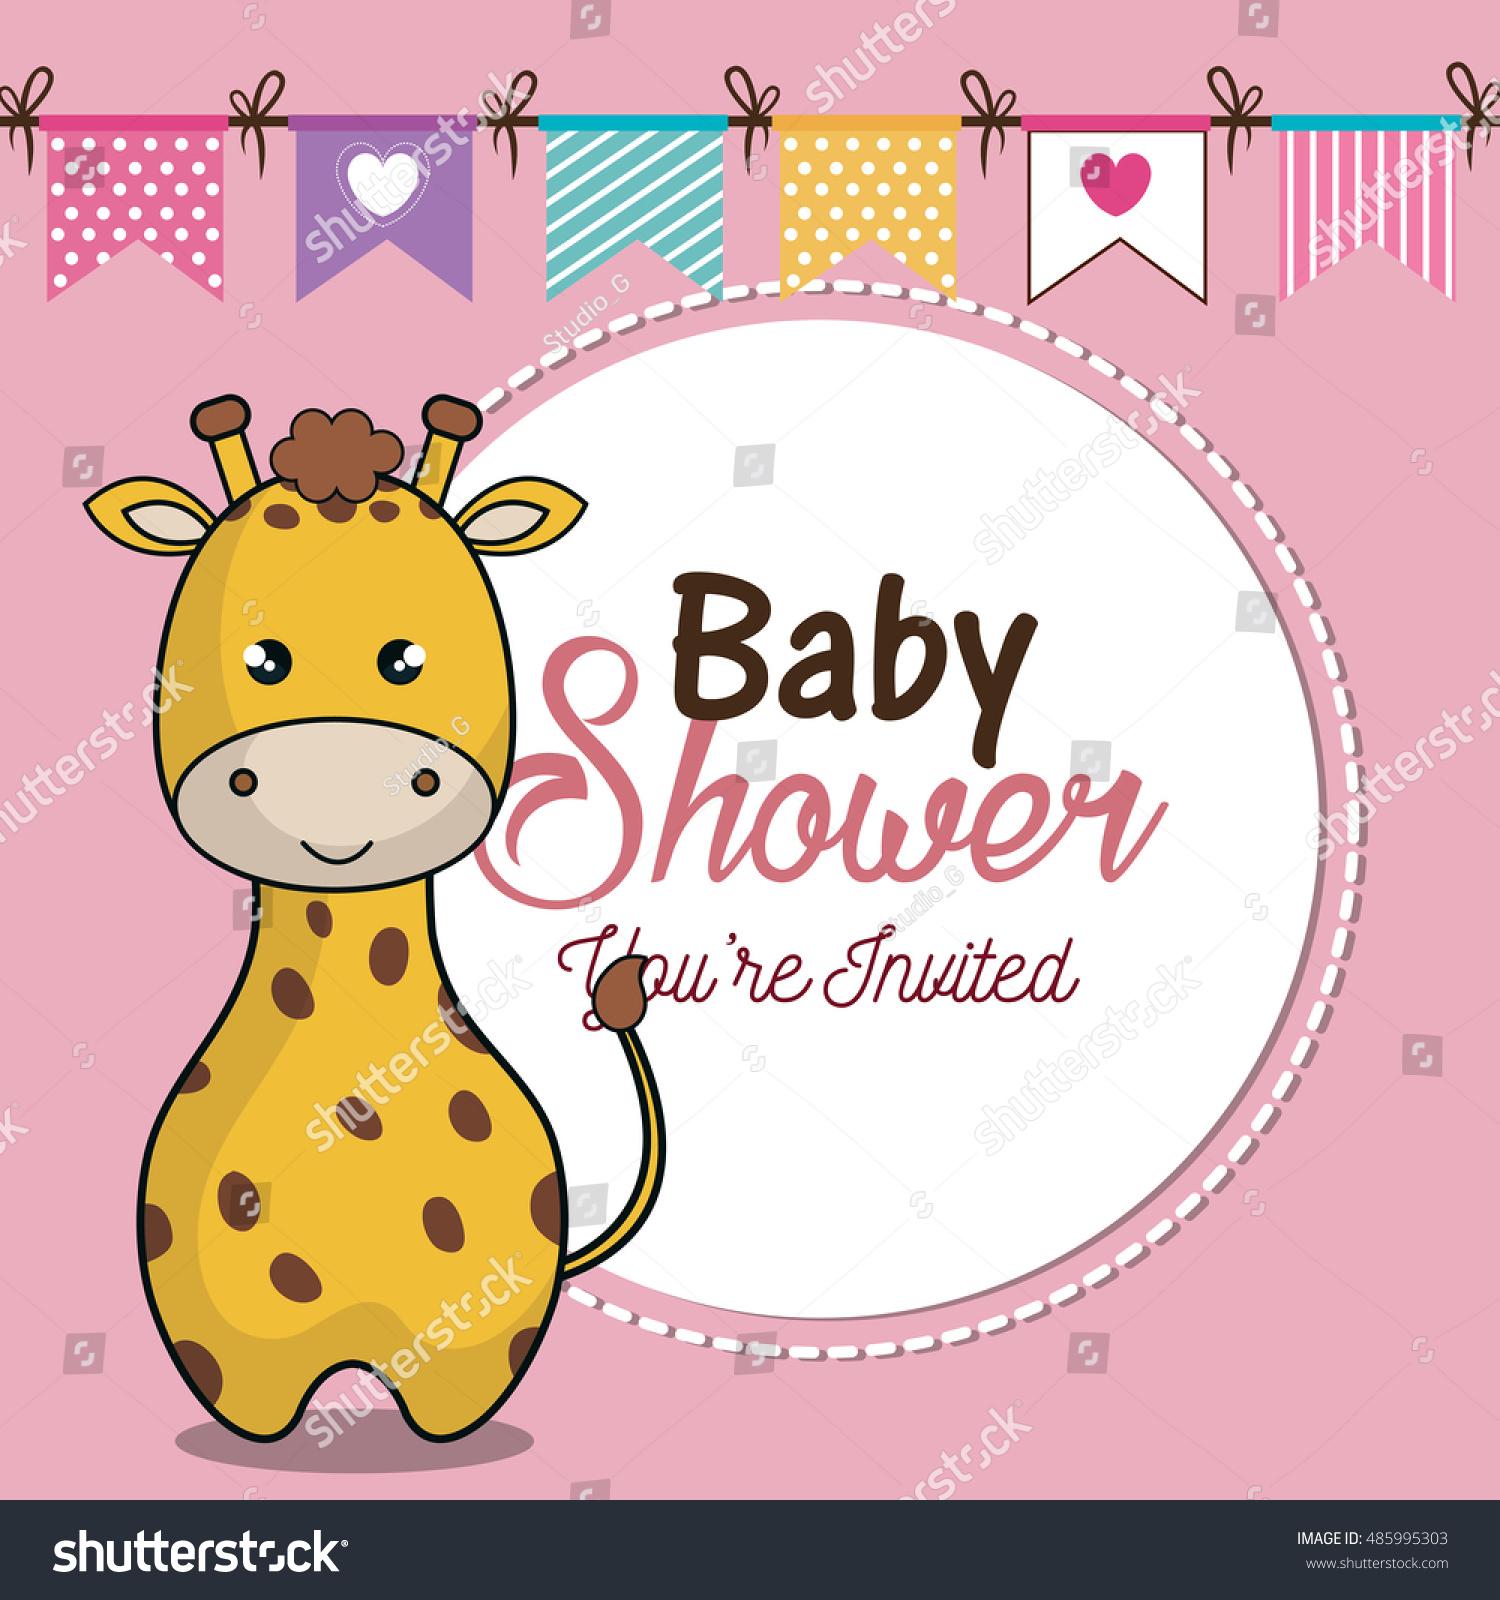 Invitation Baby Shower Card Giraffe Desing Stock Vector